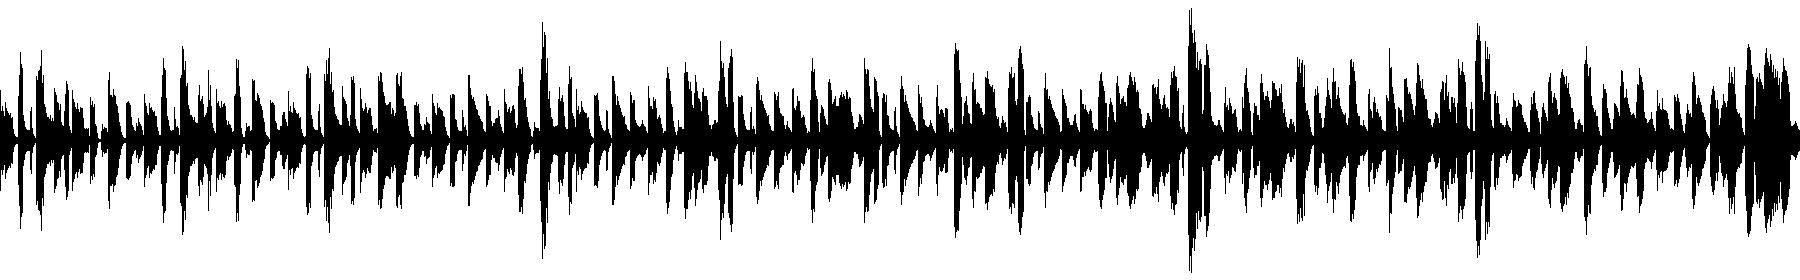 1 am 126 demo sax loop raul romo